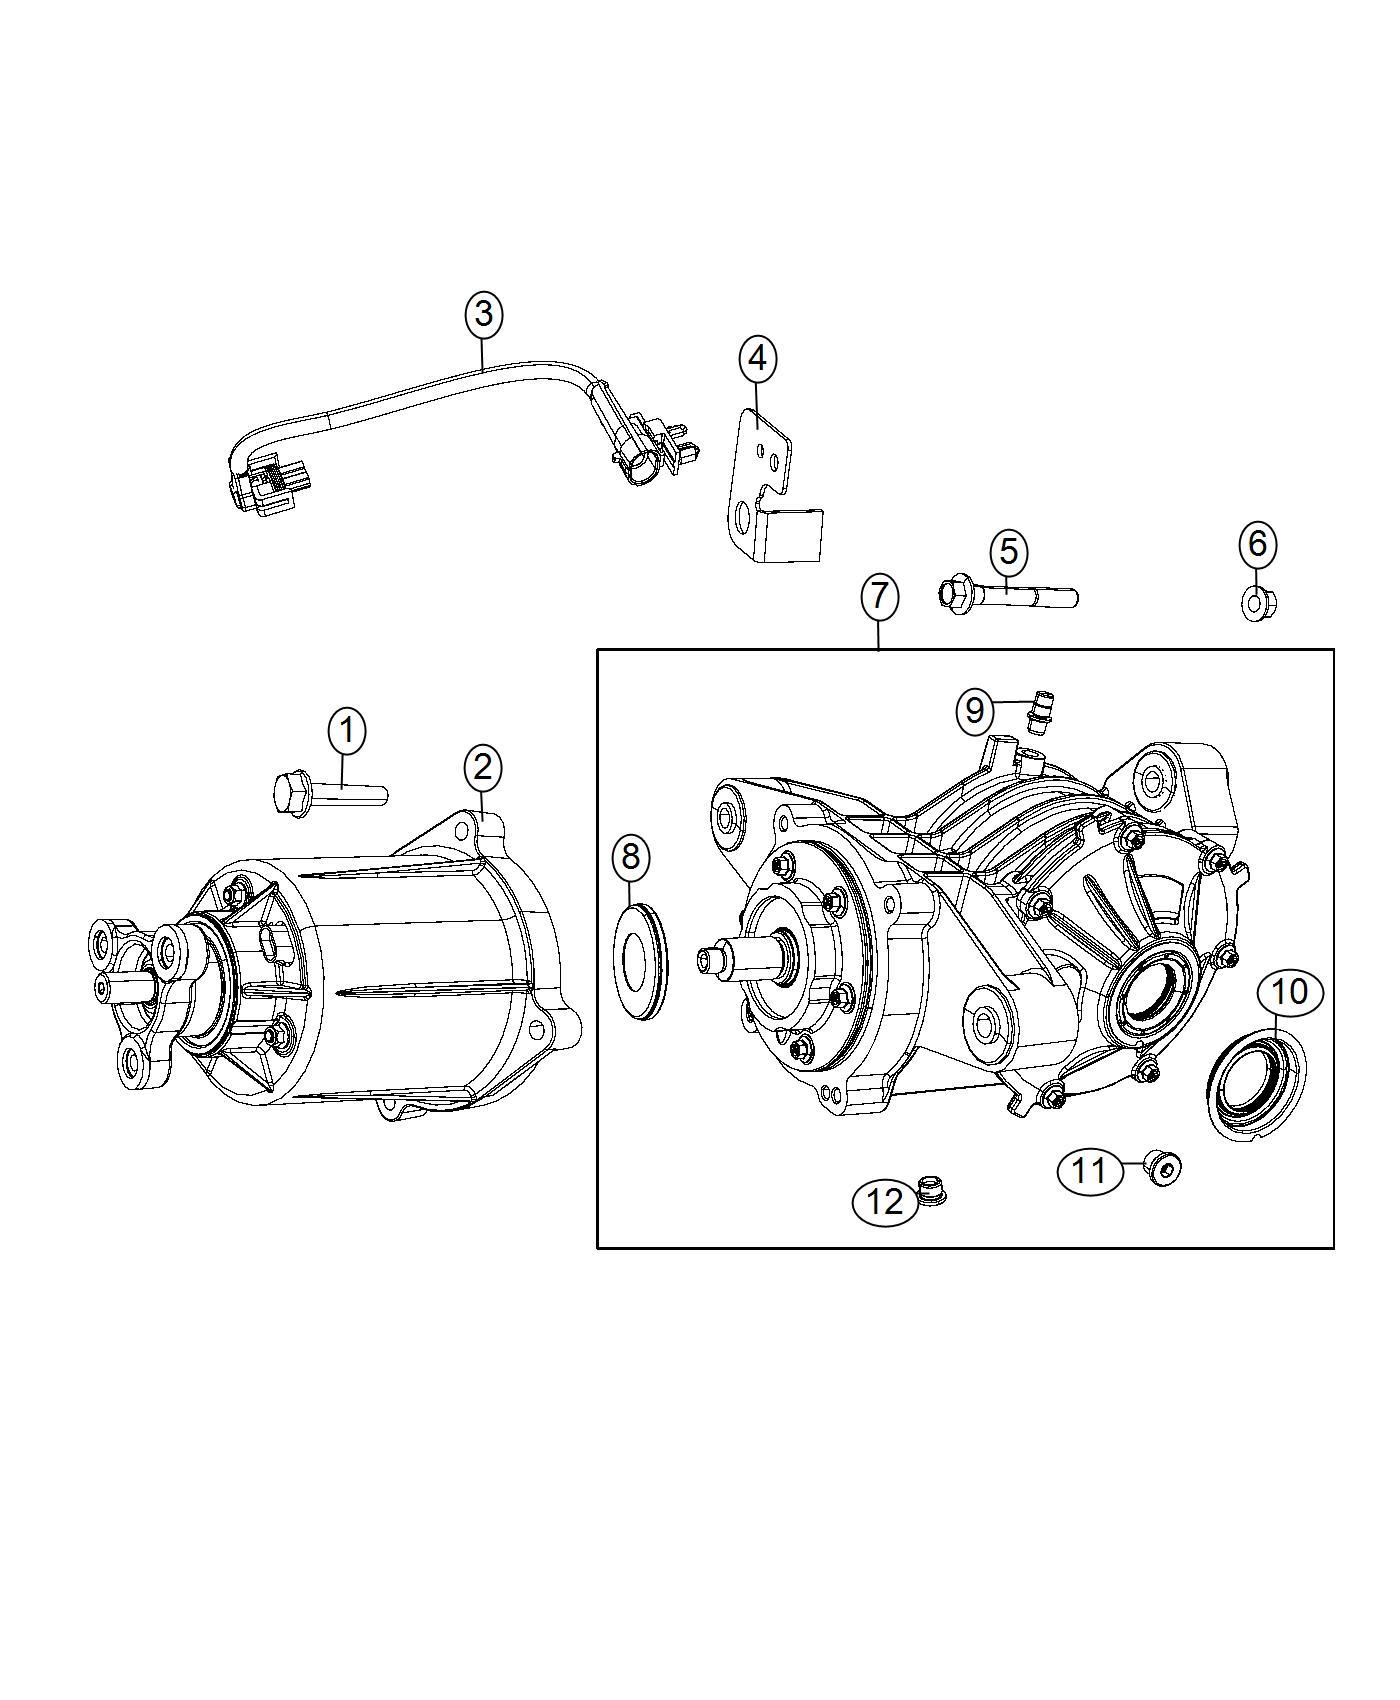 Dodge Journey Bracket Wiring Ecc Jumper To Rdm Module Suspension Rear